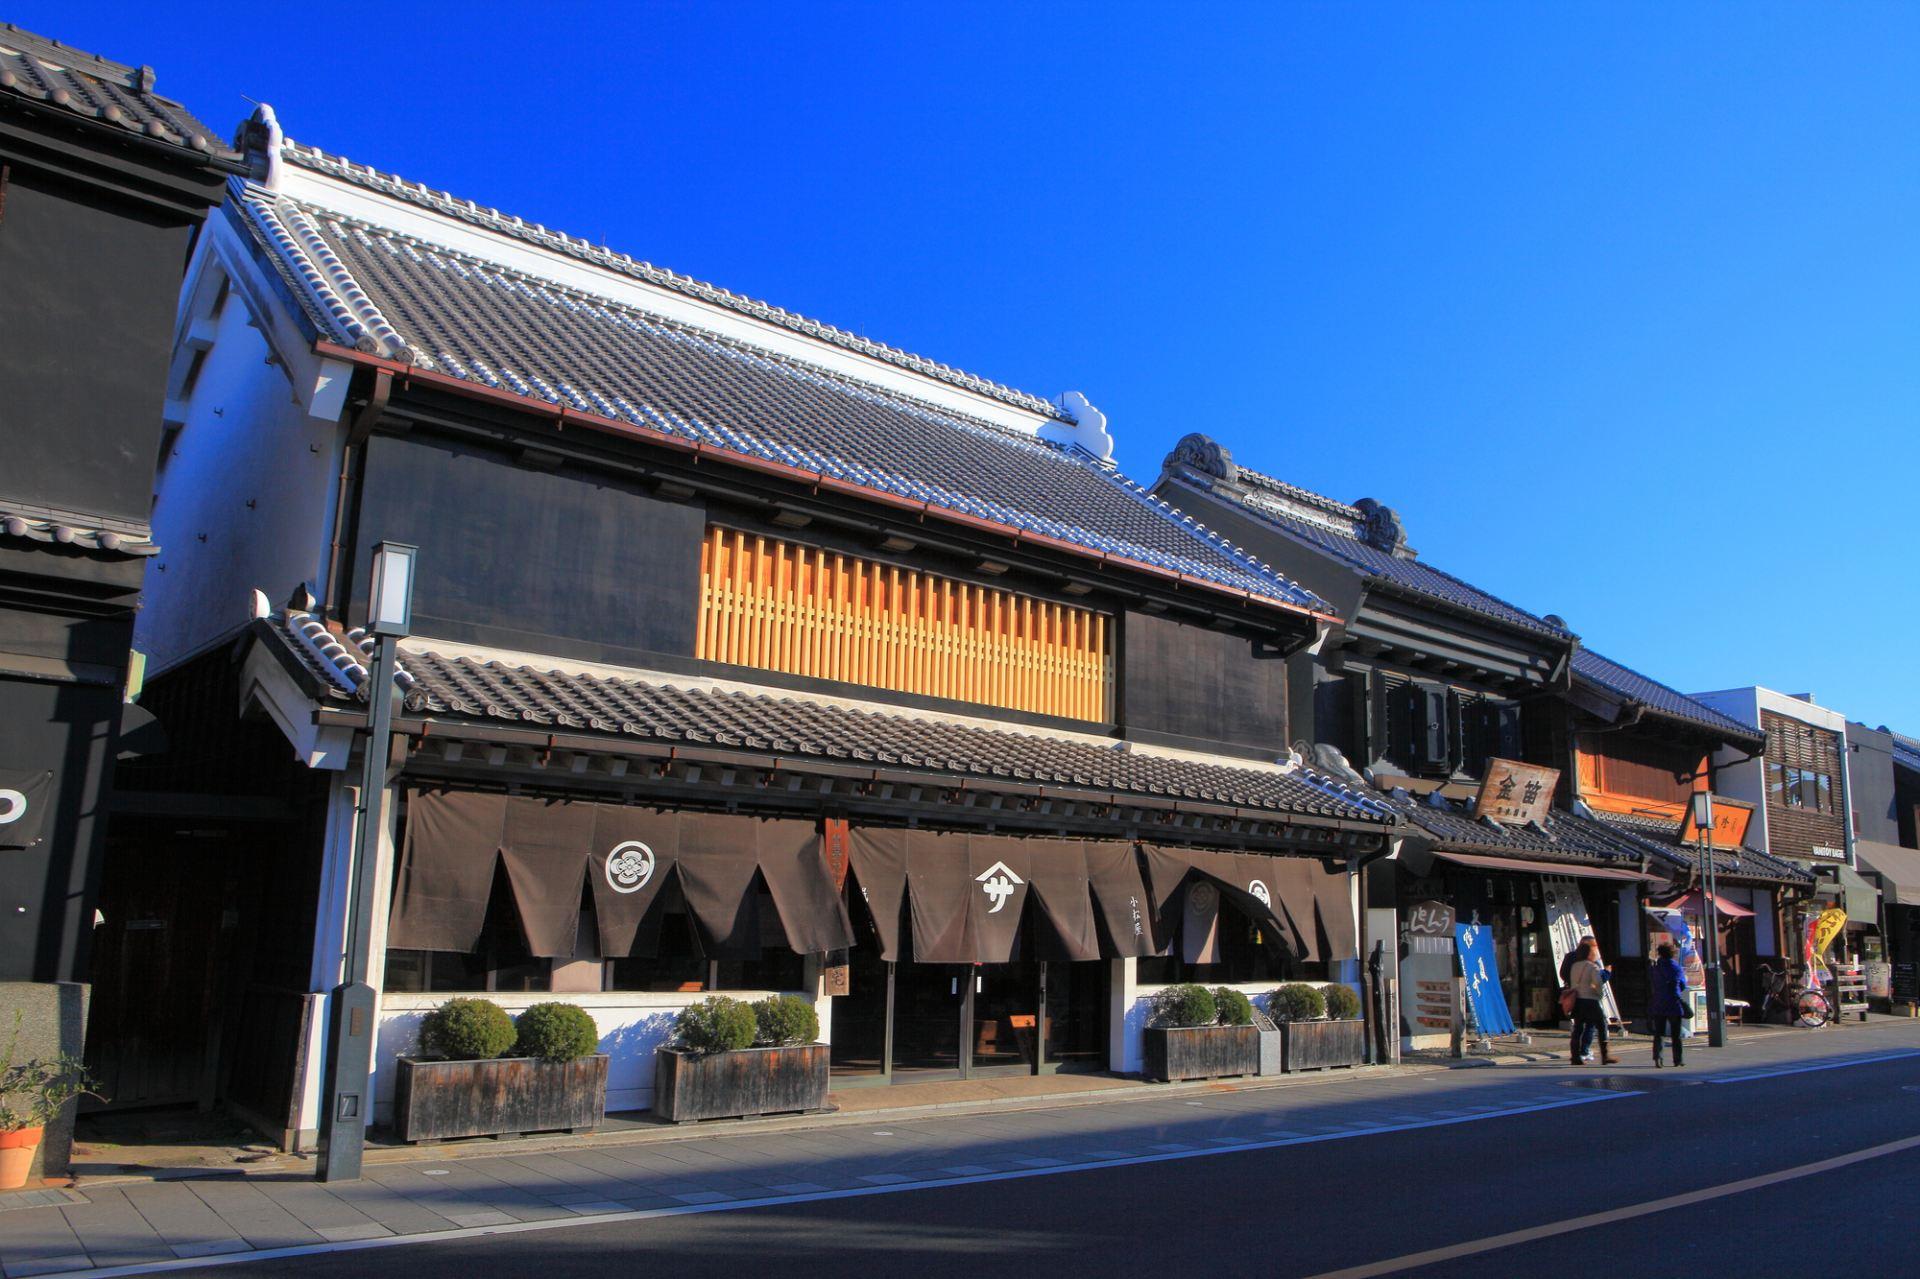 Kawagoe, Kurazukuri Town, Osawa Family Residence